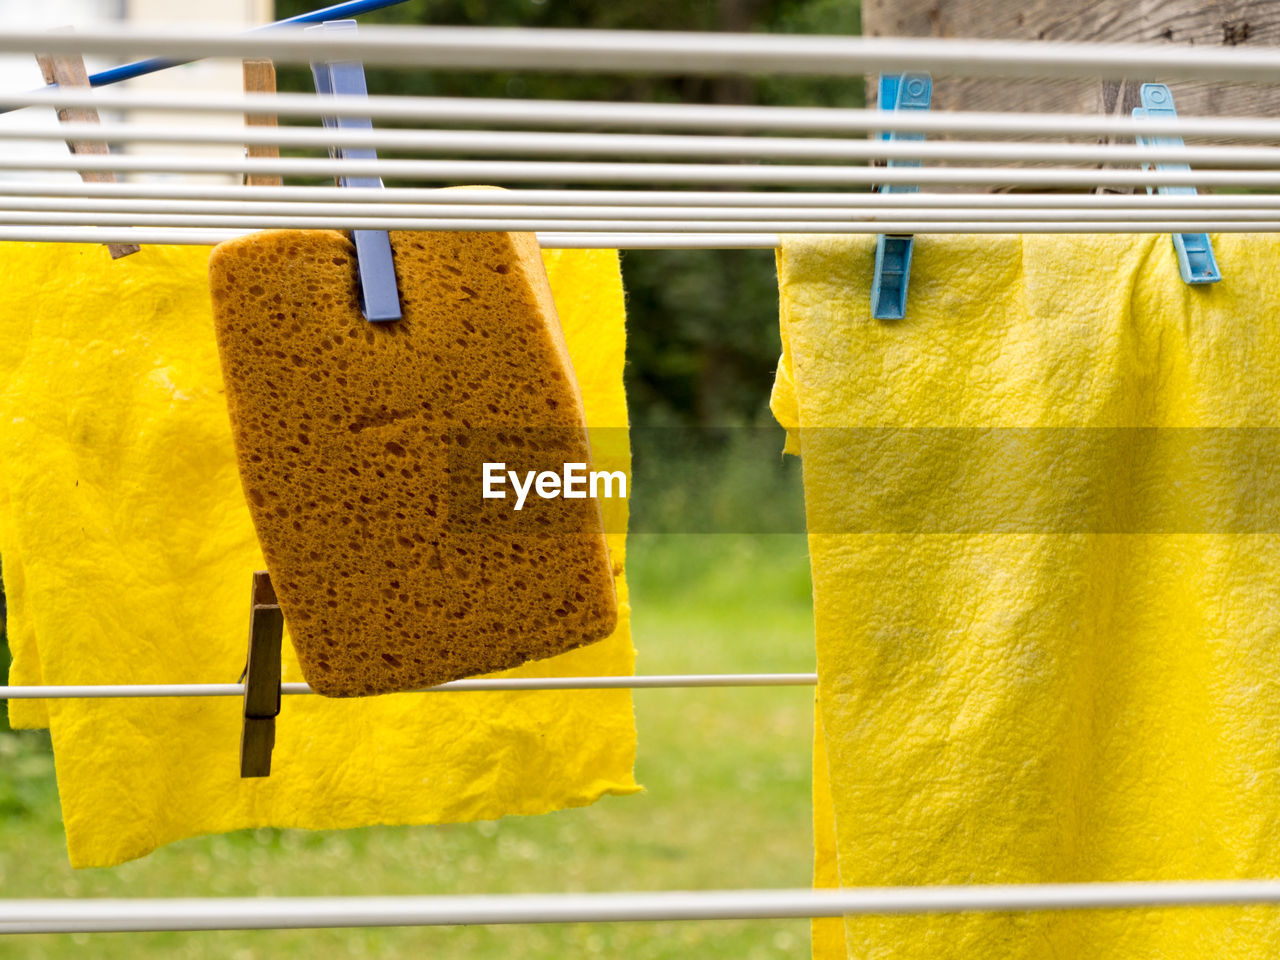 Close-Up Of Napkins And Sponge Hanging On Clothesline